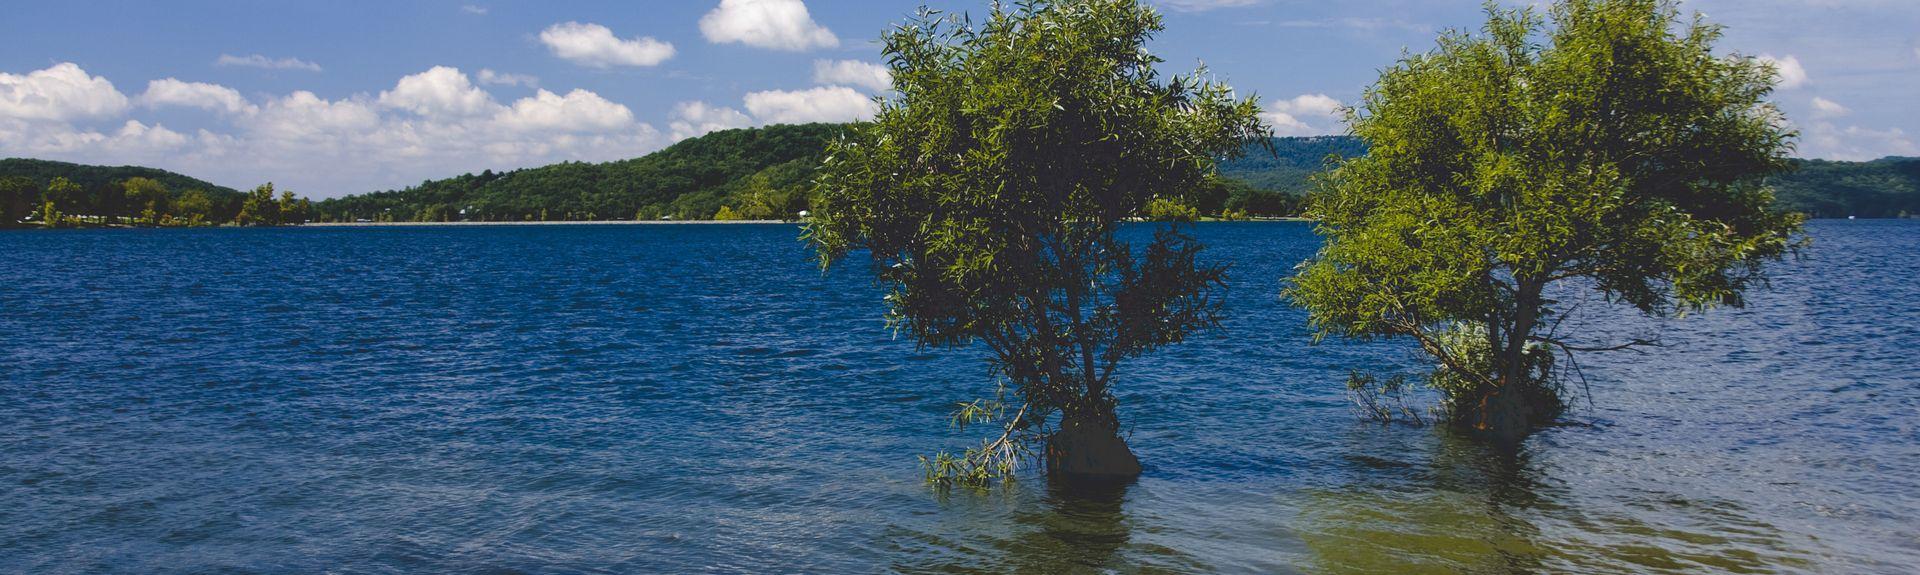 Beaver Lake, Rogers, Arkansas, United States of America